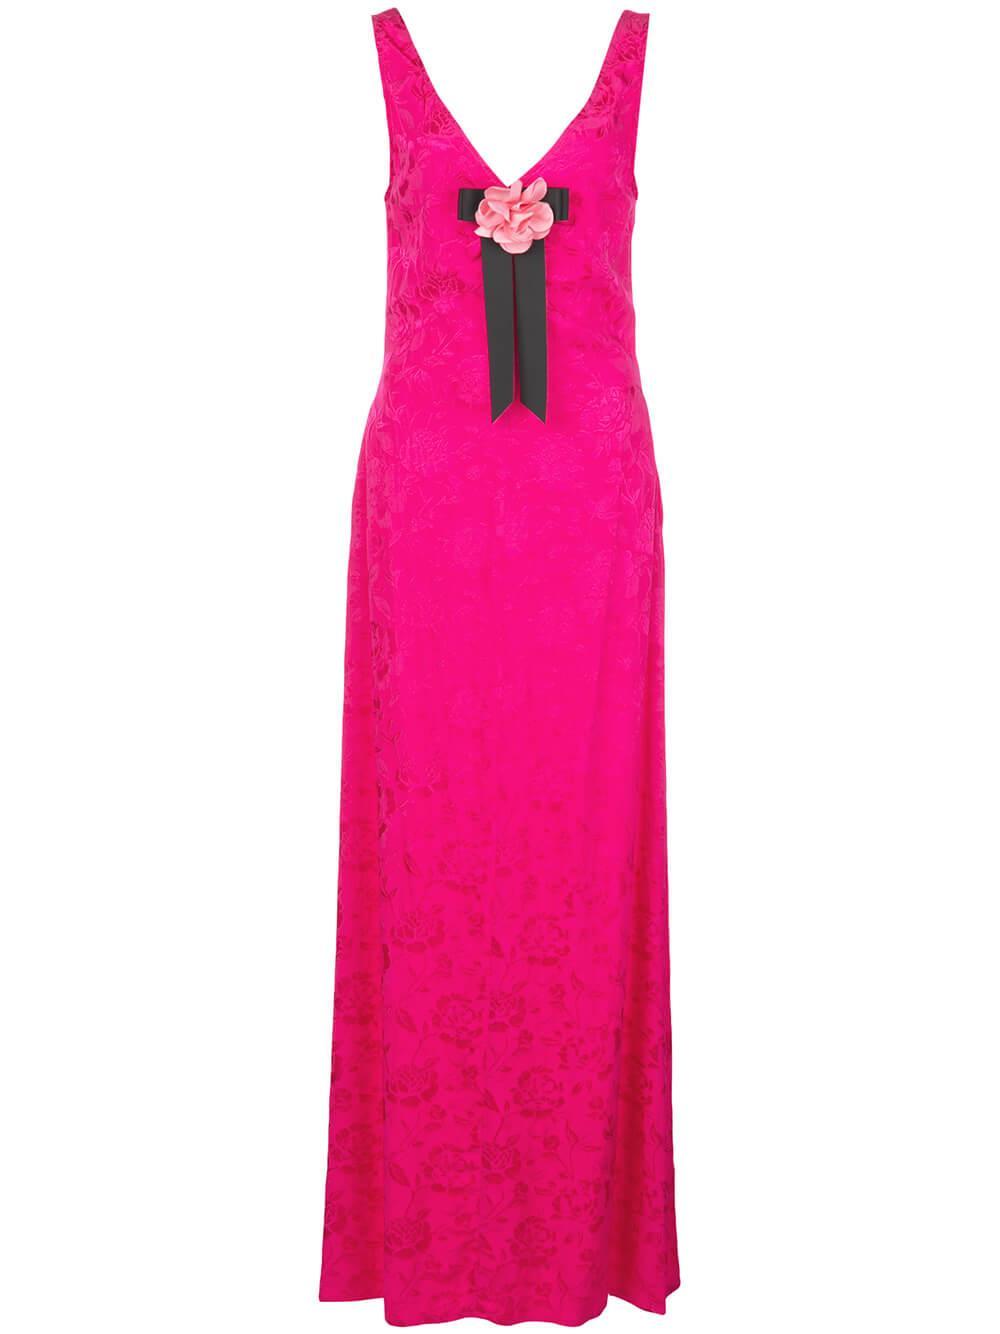 Setter Floral Damask Maxi Dress Item # 167-7332-PENY